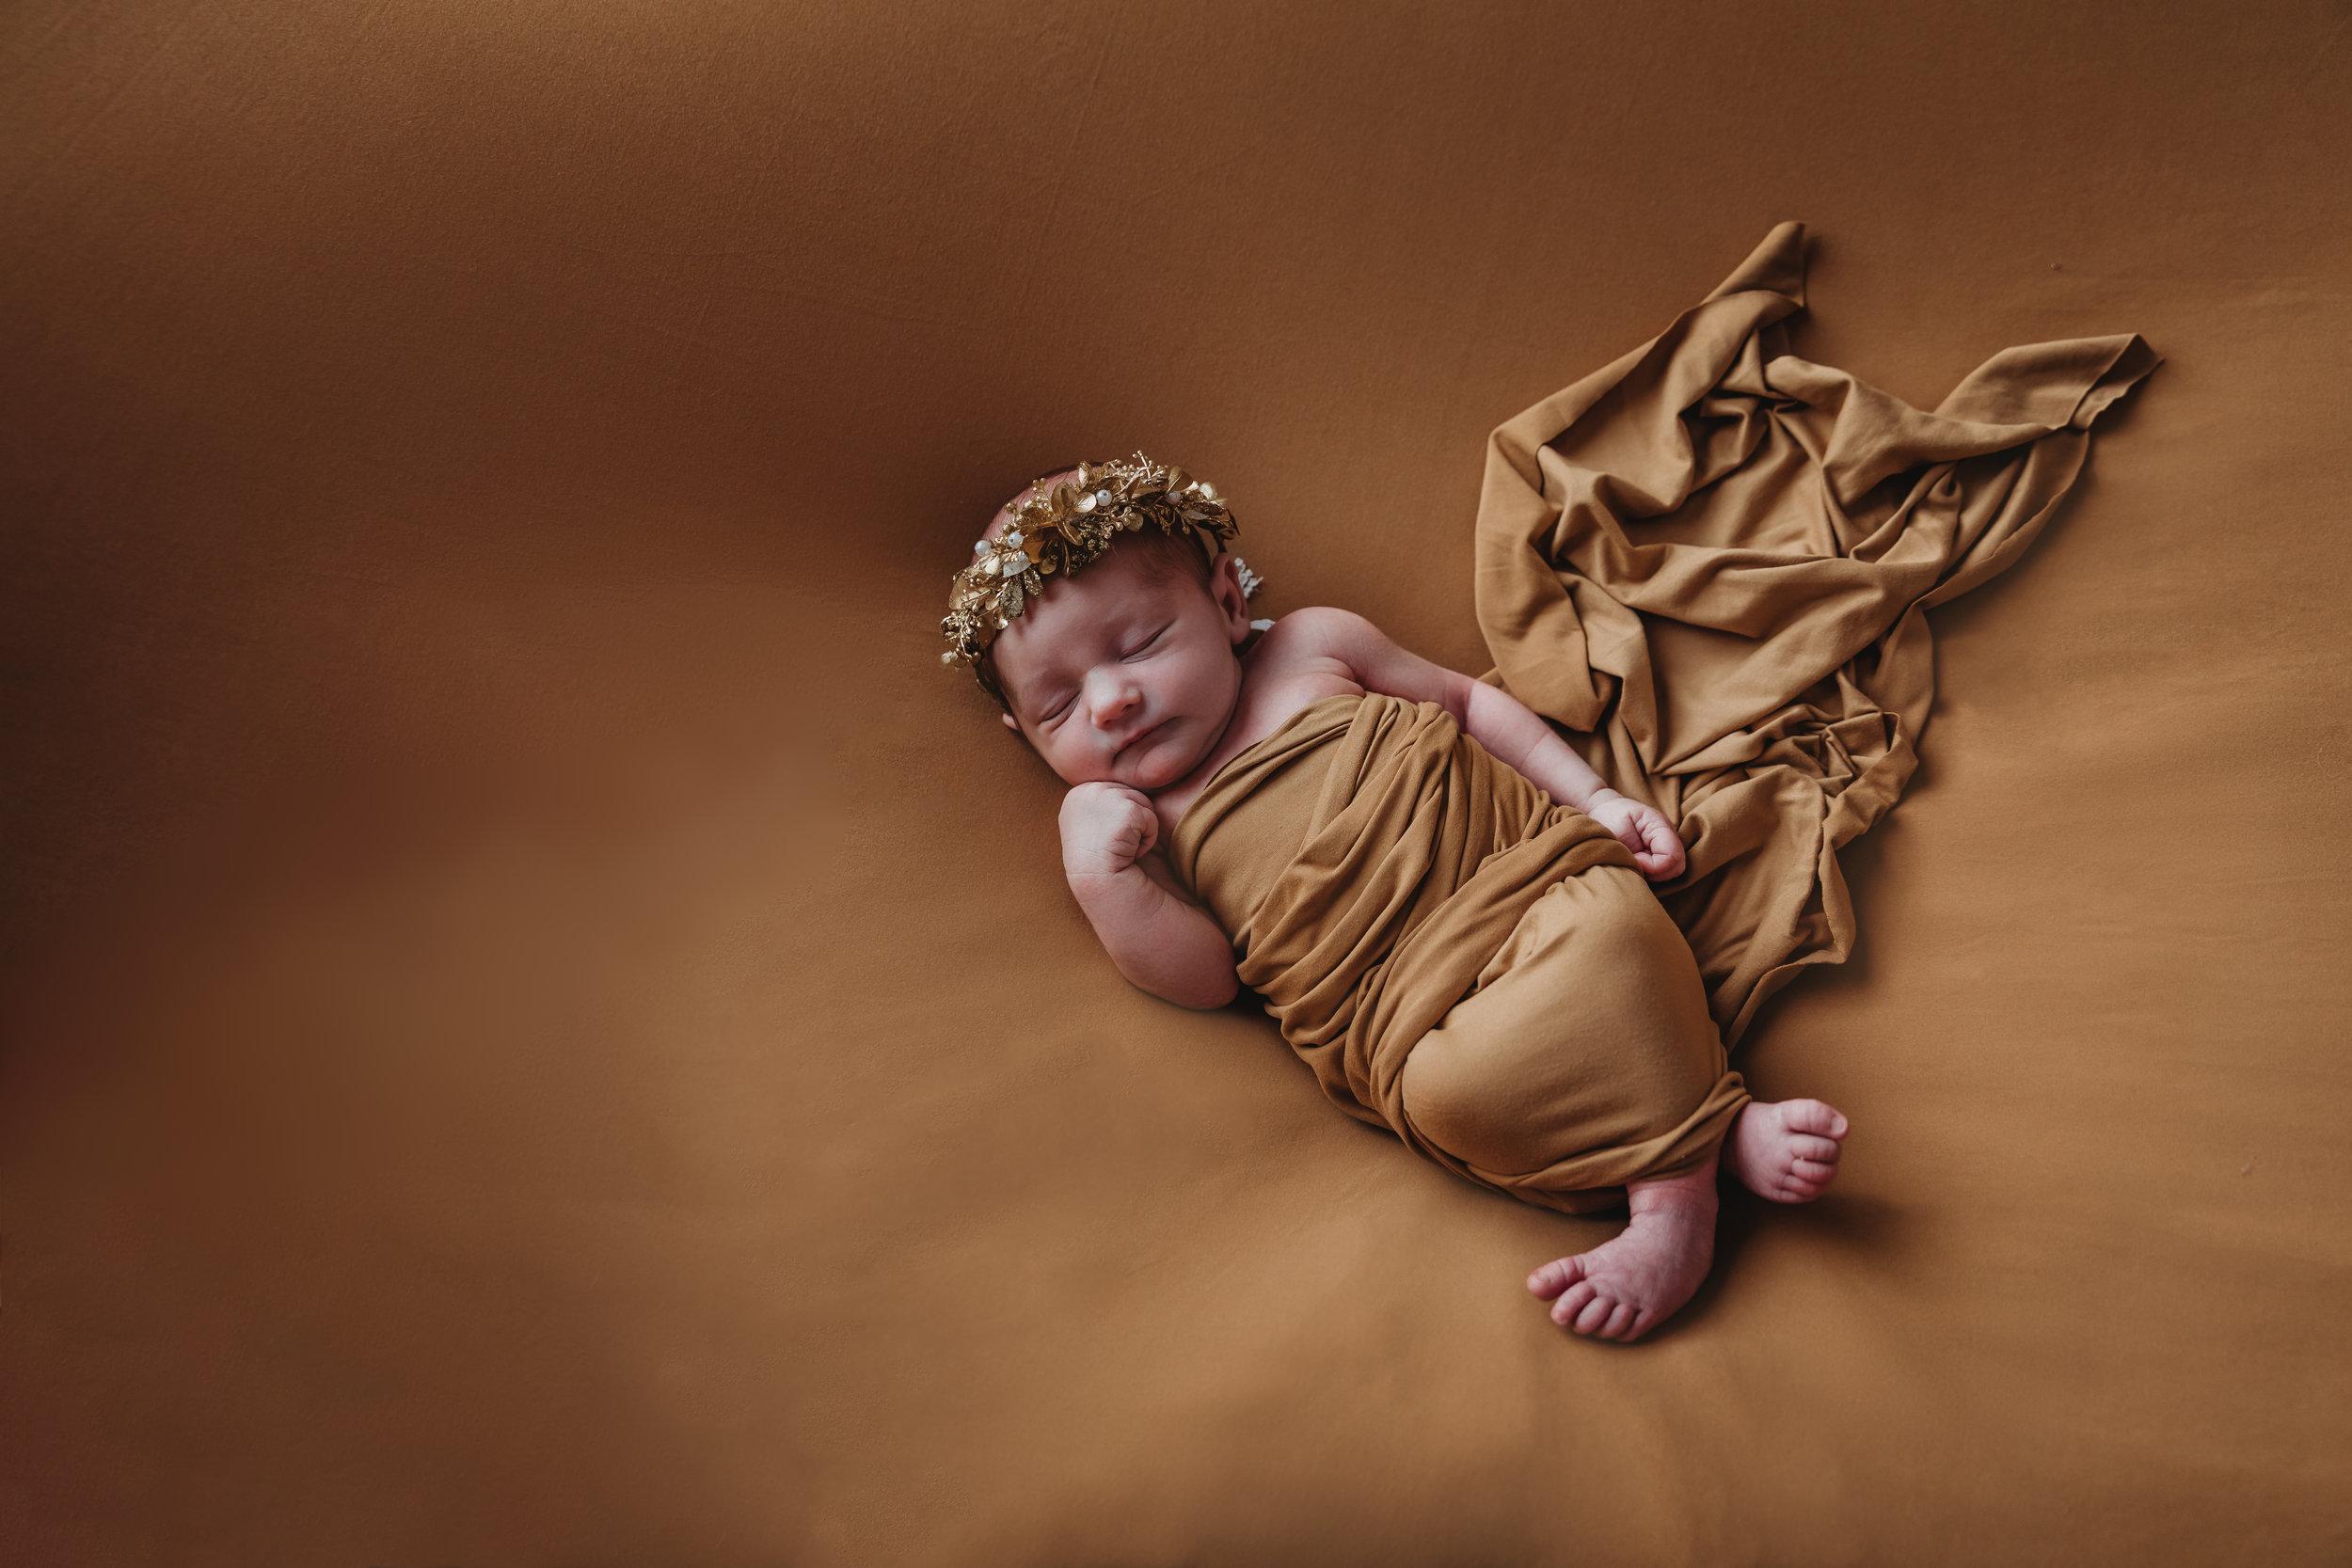 newborn-photography-austin-minnesota-studio-albert-lea-minnesota-gold-modern